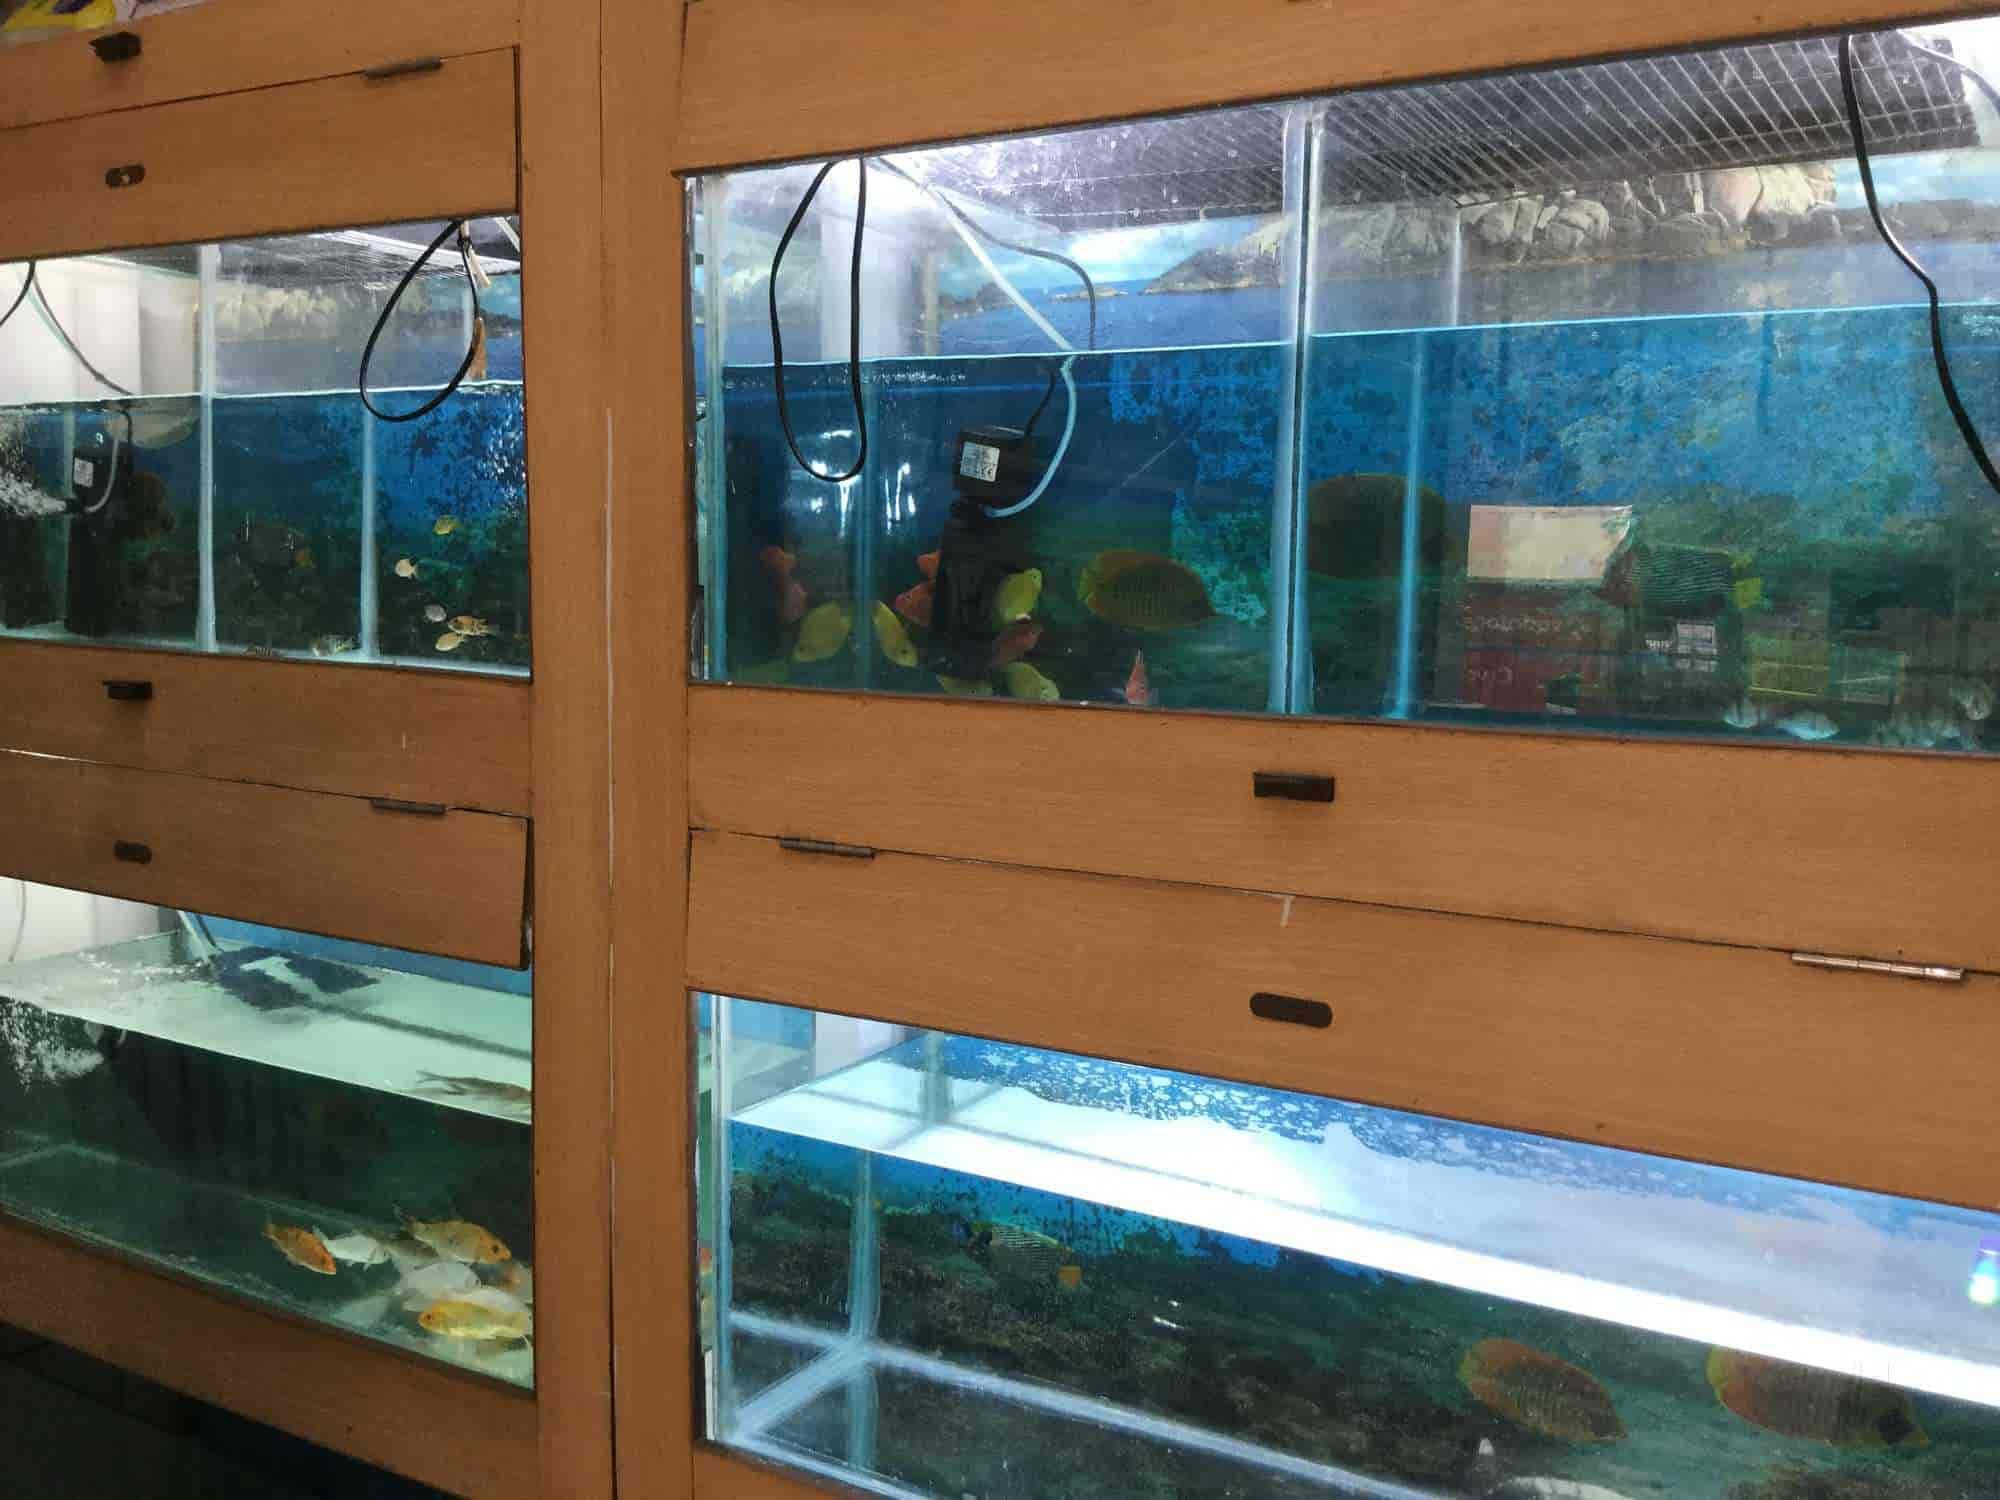 RAJA Aquarium Sahid Nagar Pet Shops in Bhubaneshwar Justdial